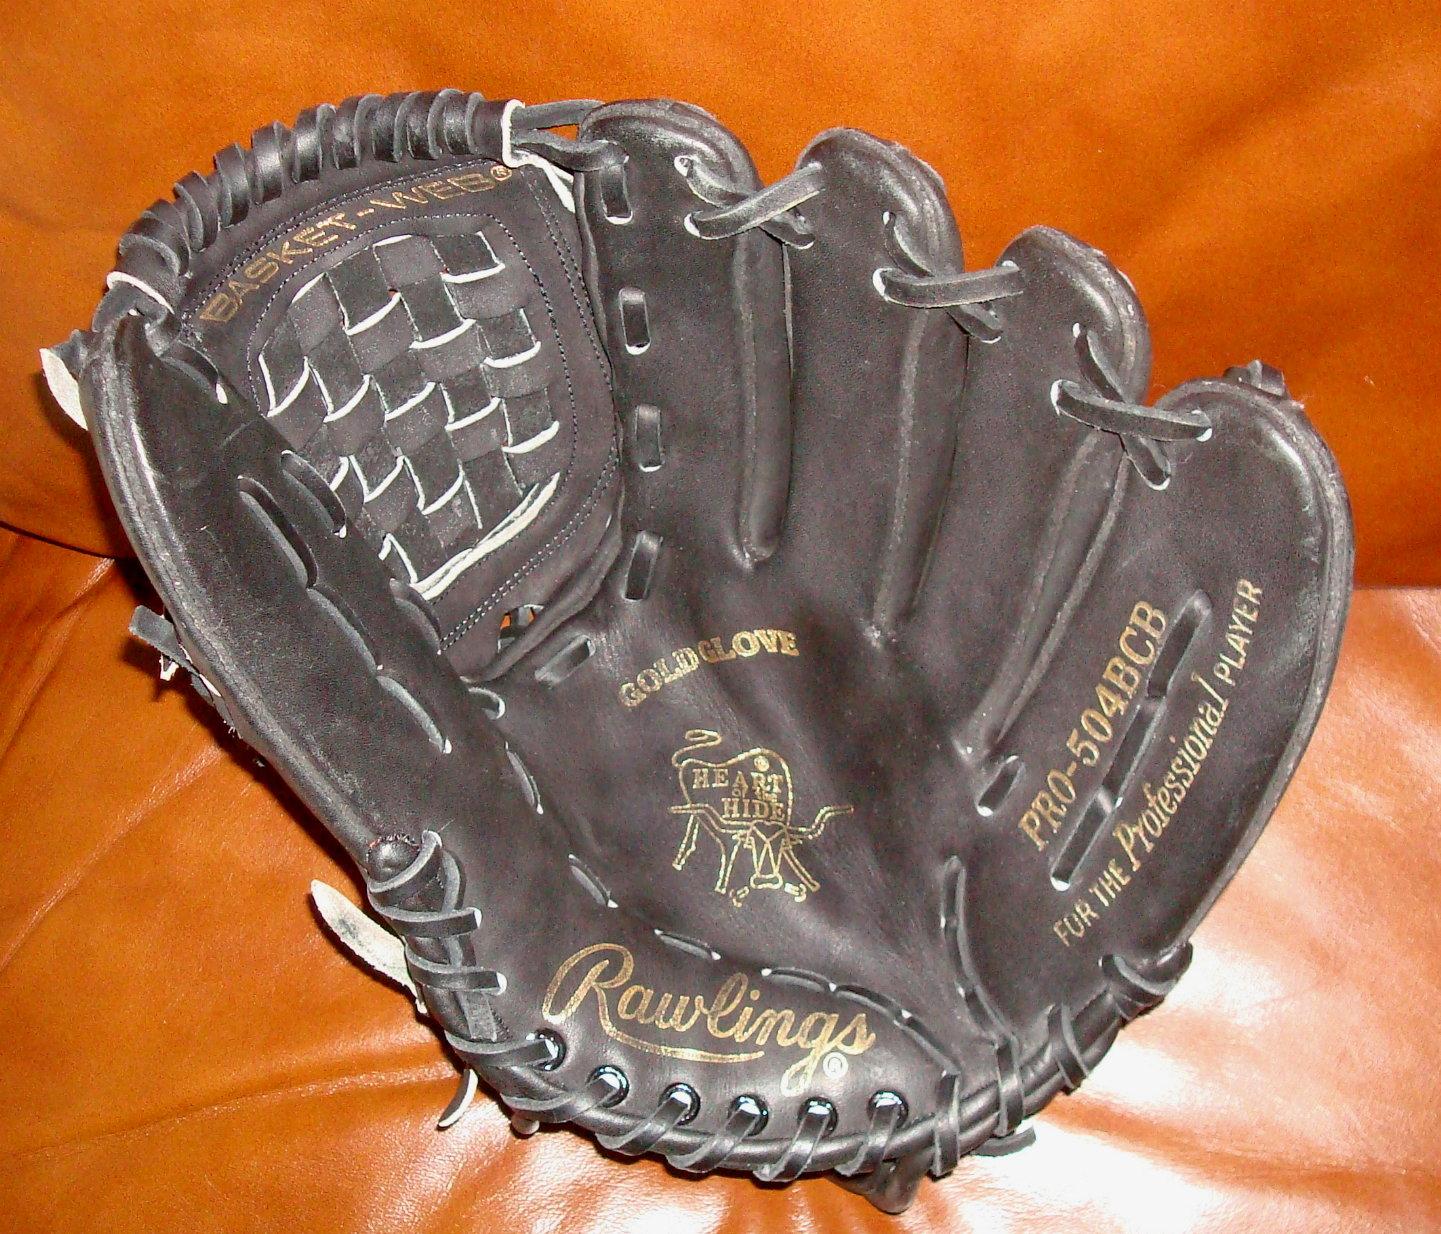 dating vintage baseball gloves